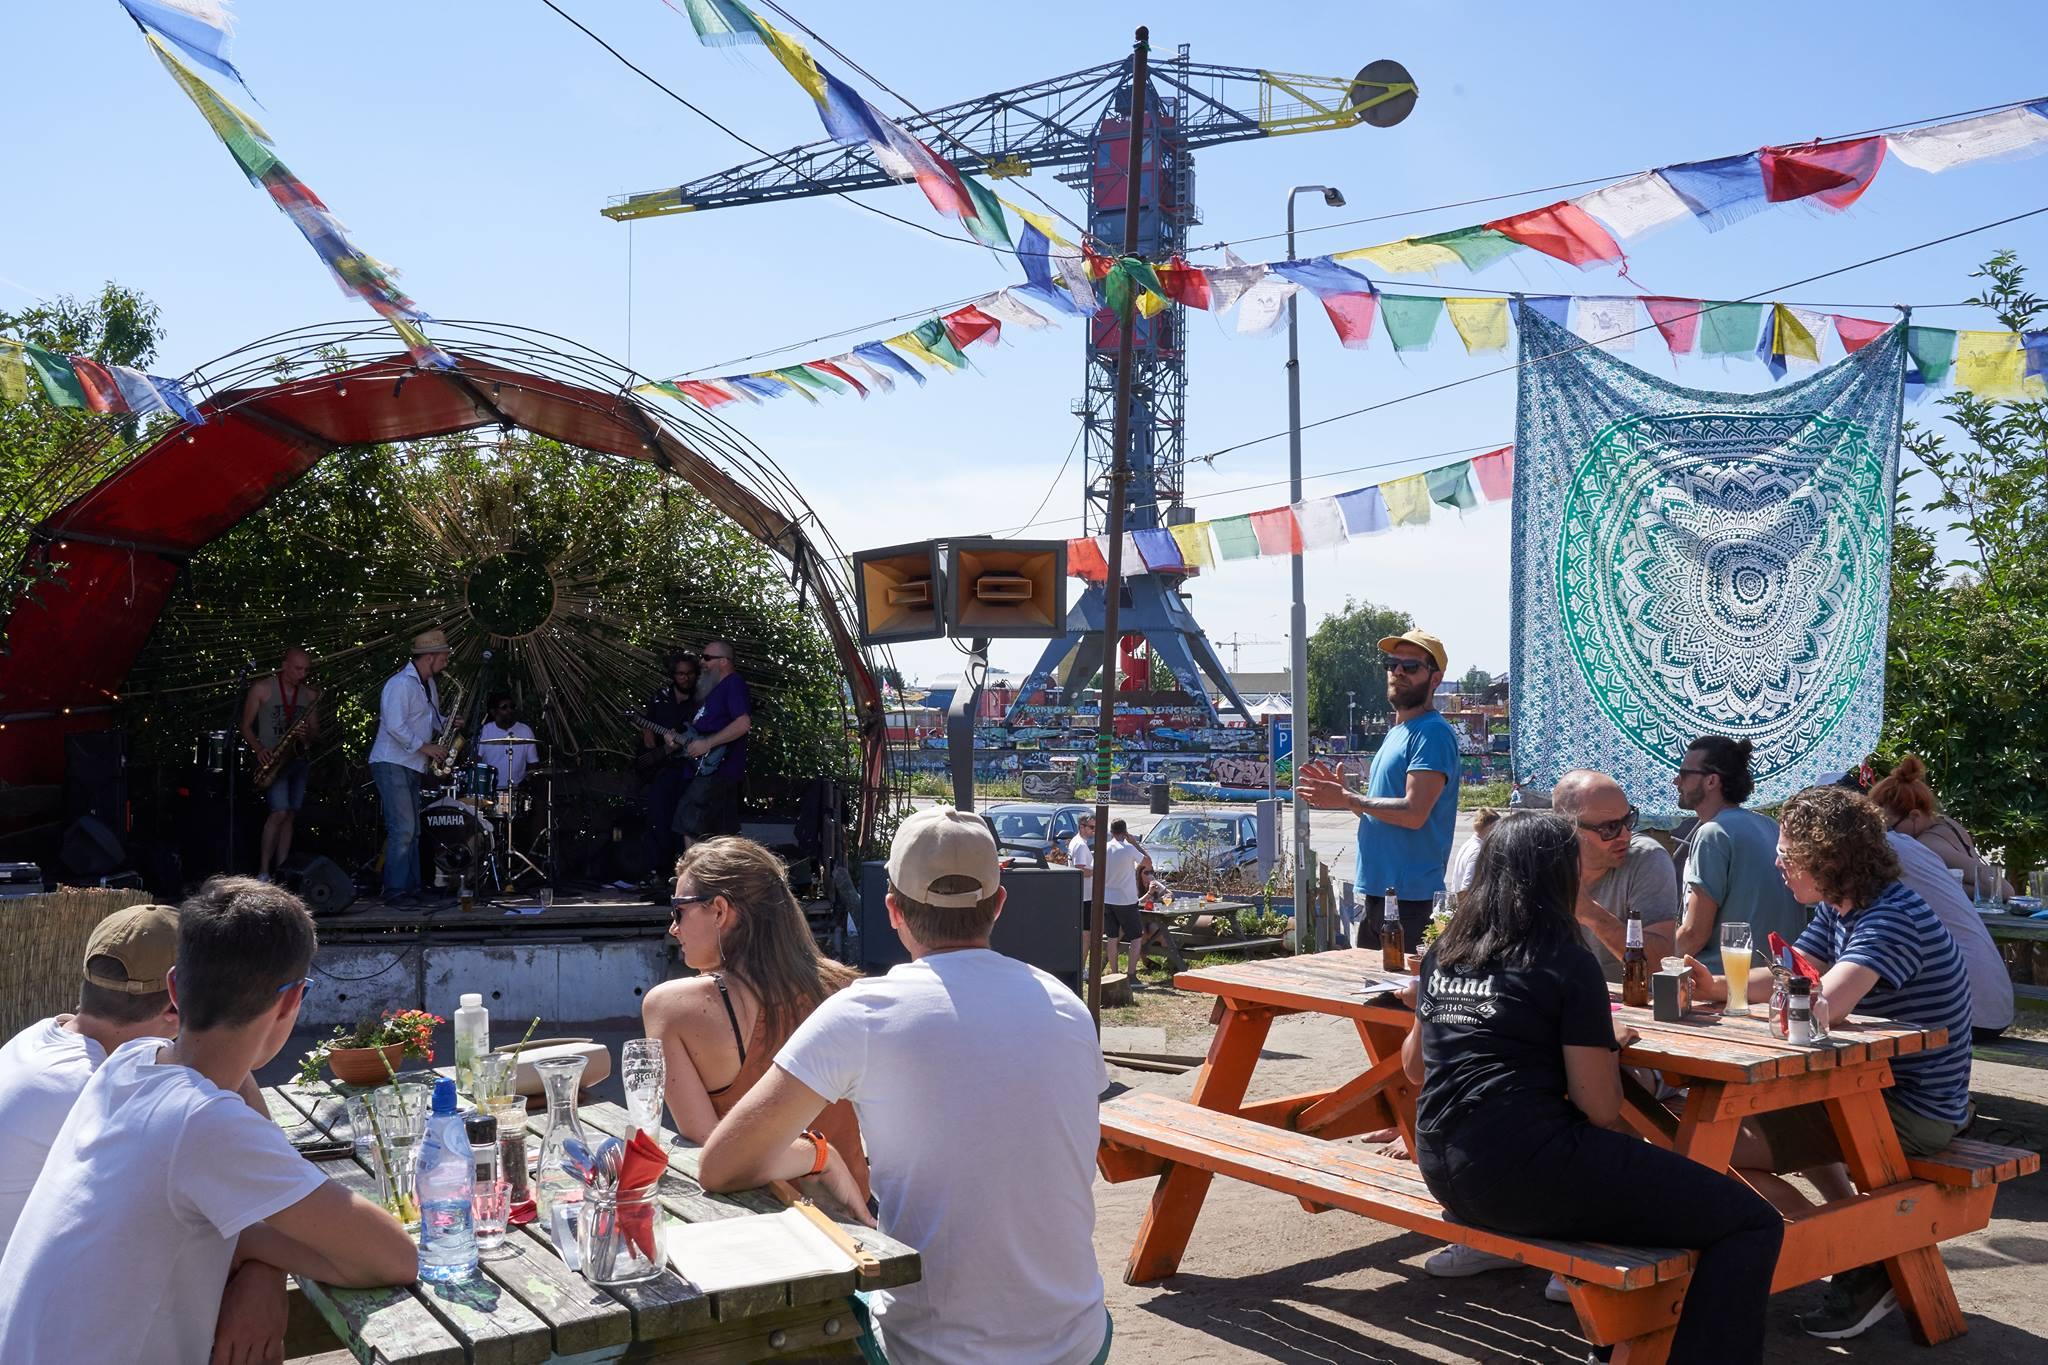 Lemon op Bevrijdingsdag Noorderlicht Café Amsterdam